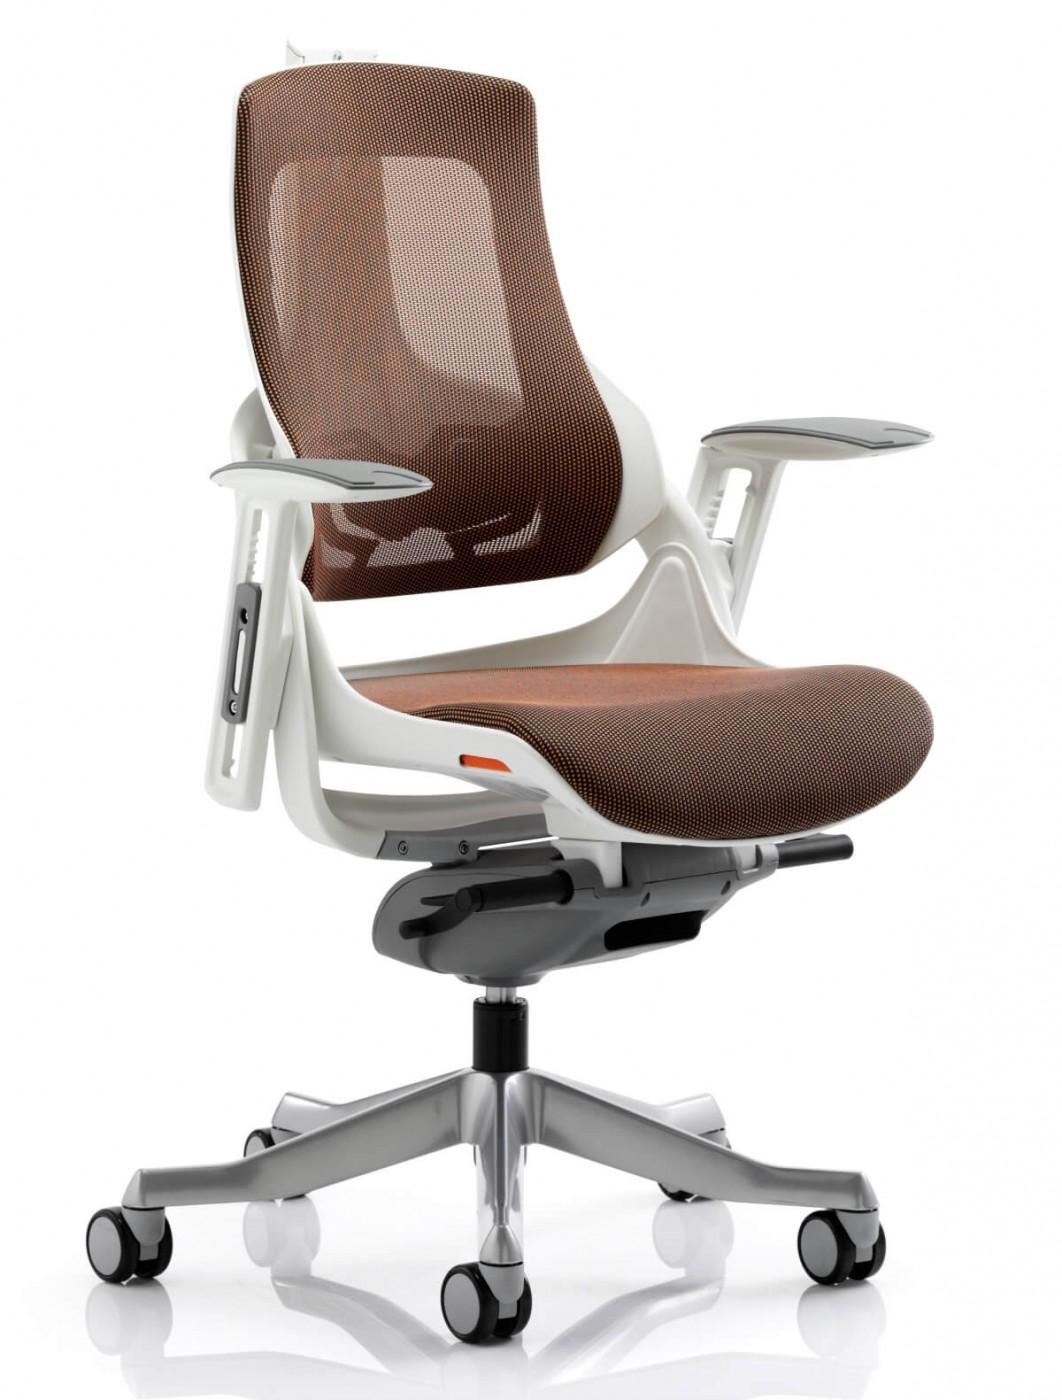 Office Chairs Zure Mandarin Executive Mesh Chair Ex000113 121 Office Furniture